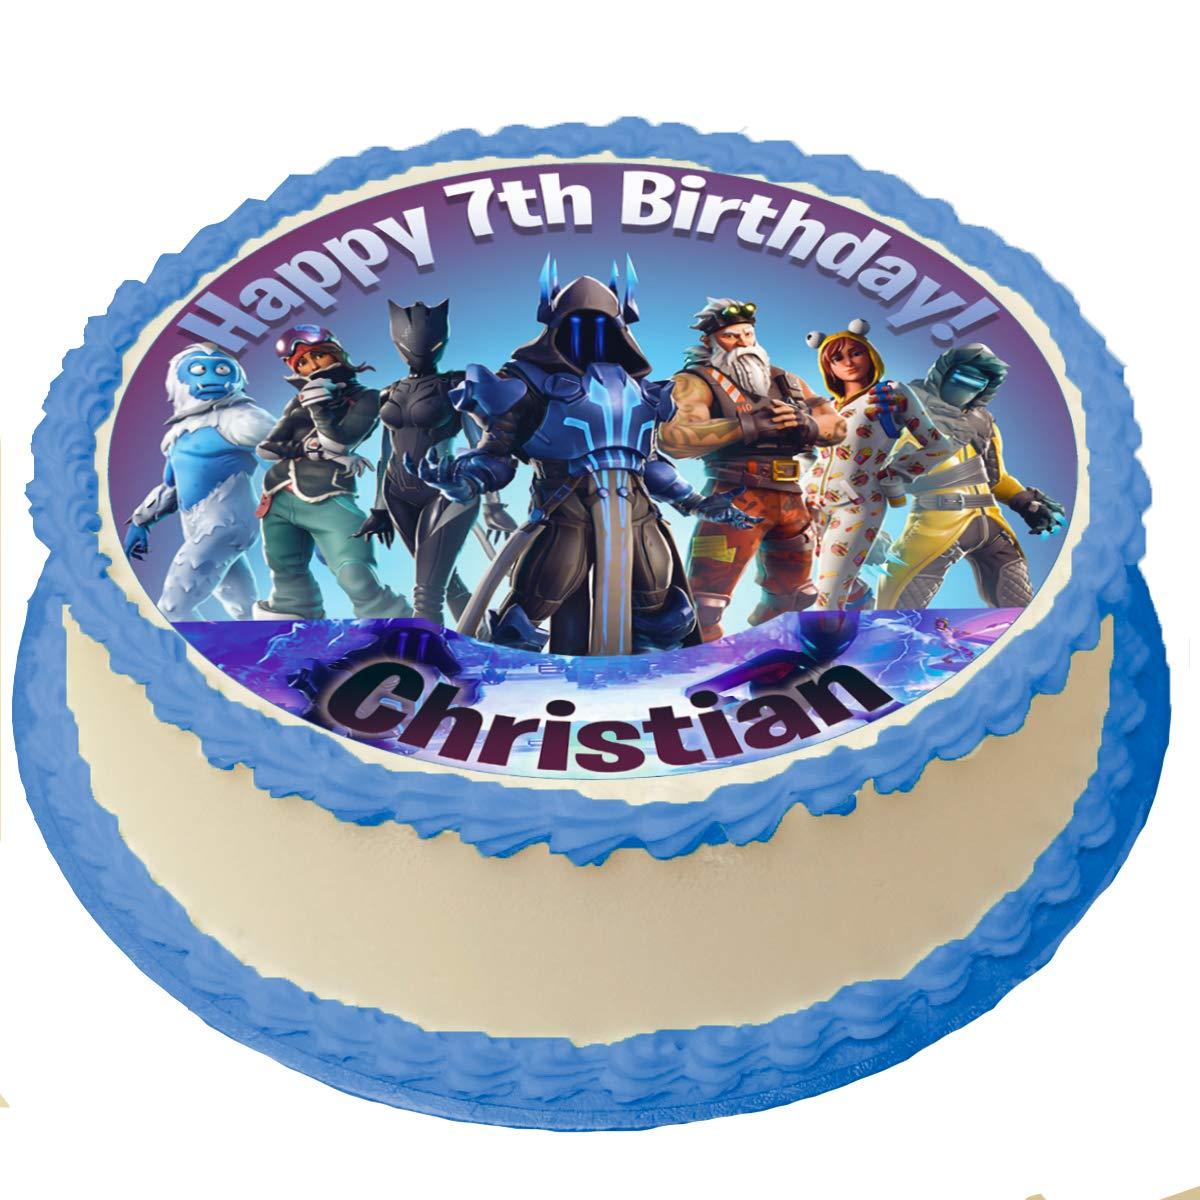 Sensational Battle Royale 7 Season Cake Topper Icing Sugar Paper 8 Inches Personalised Birthday Cards Veneteletsinfo